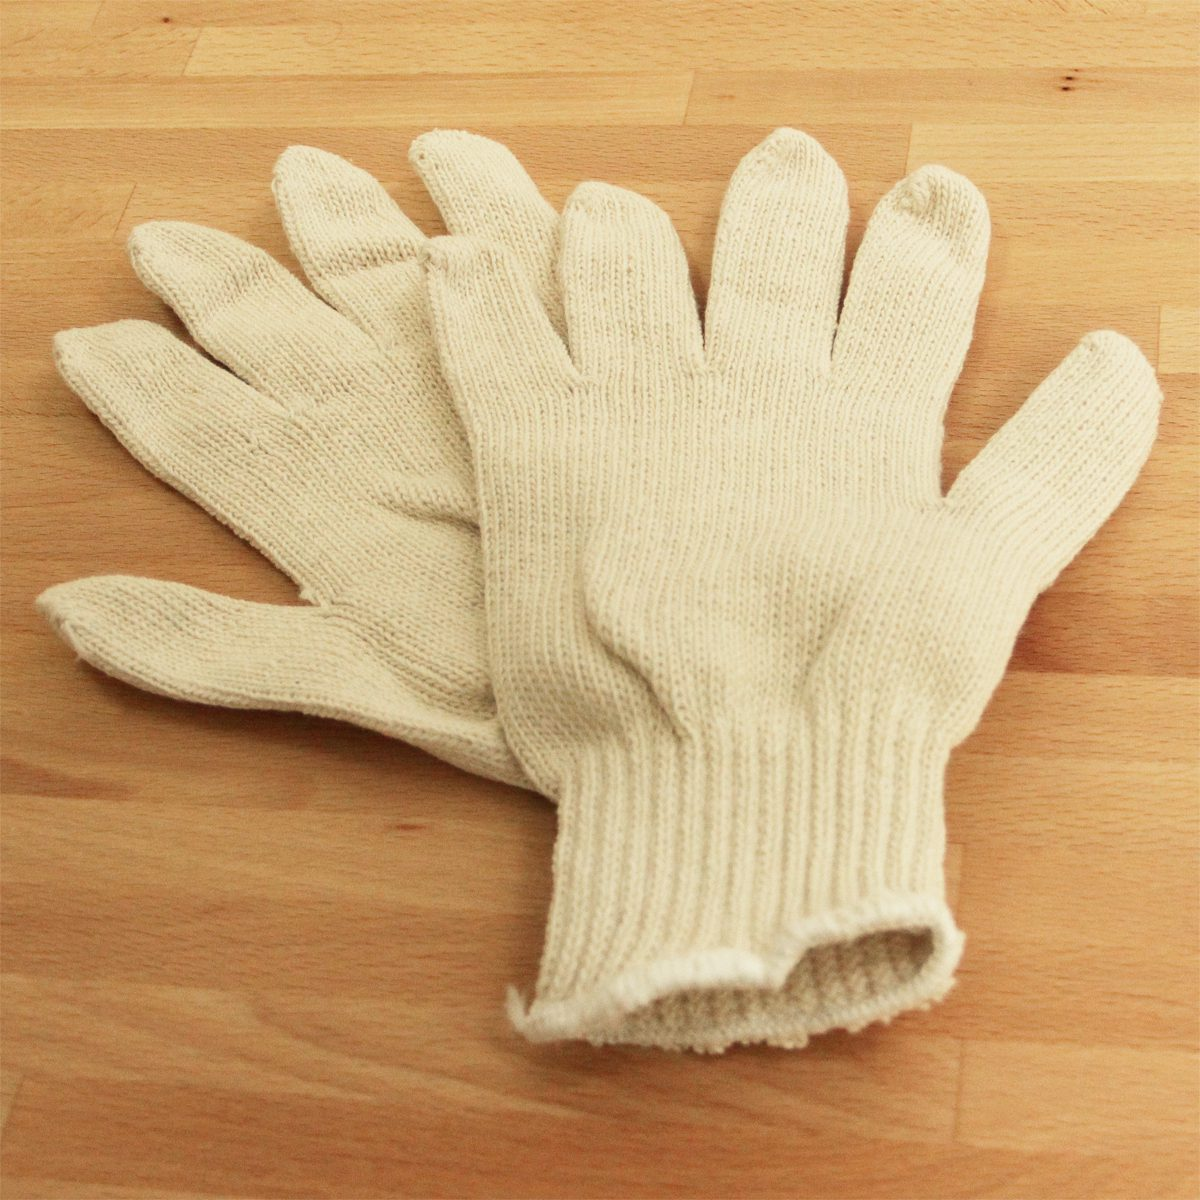 cotton string knit gloves large